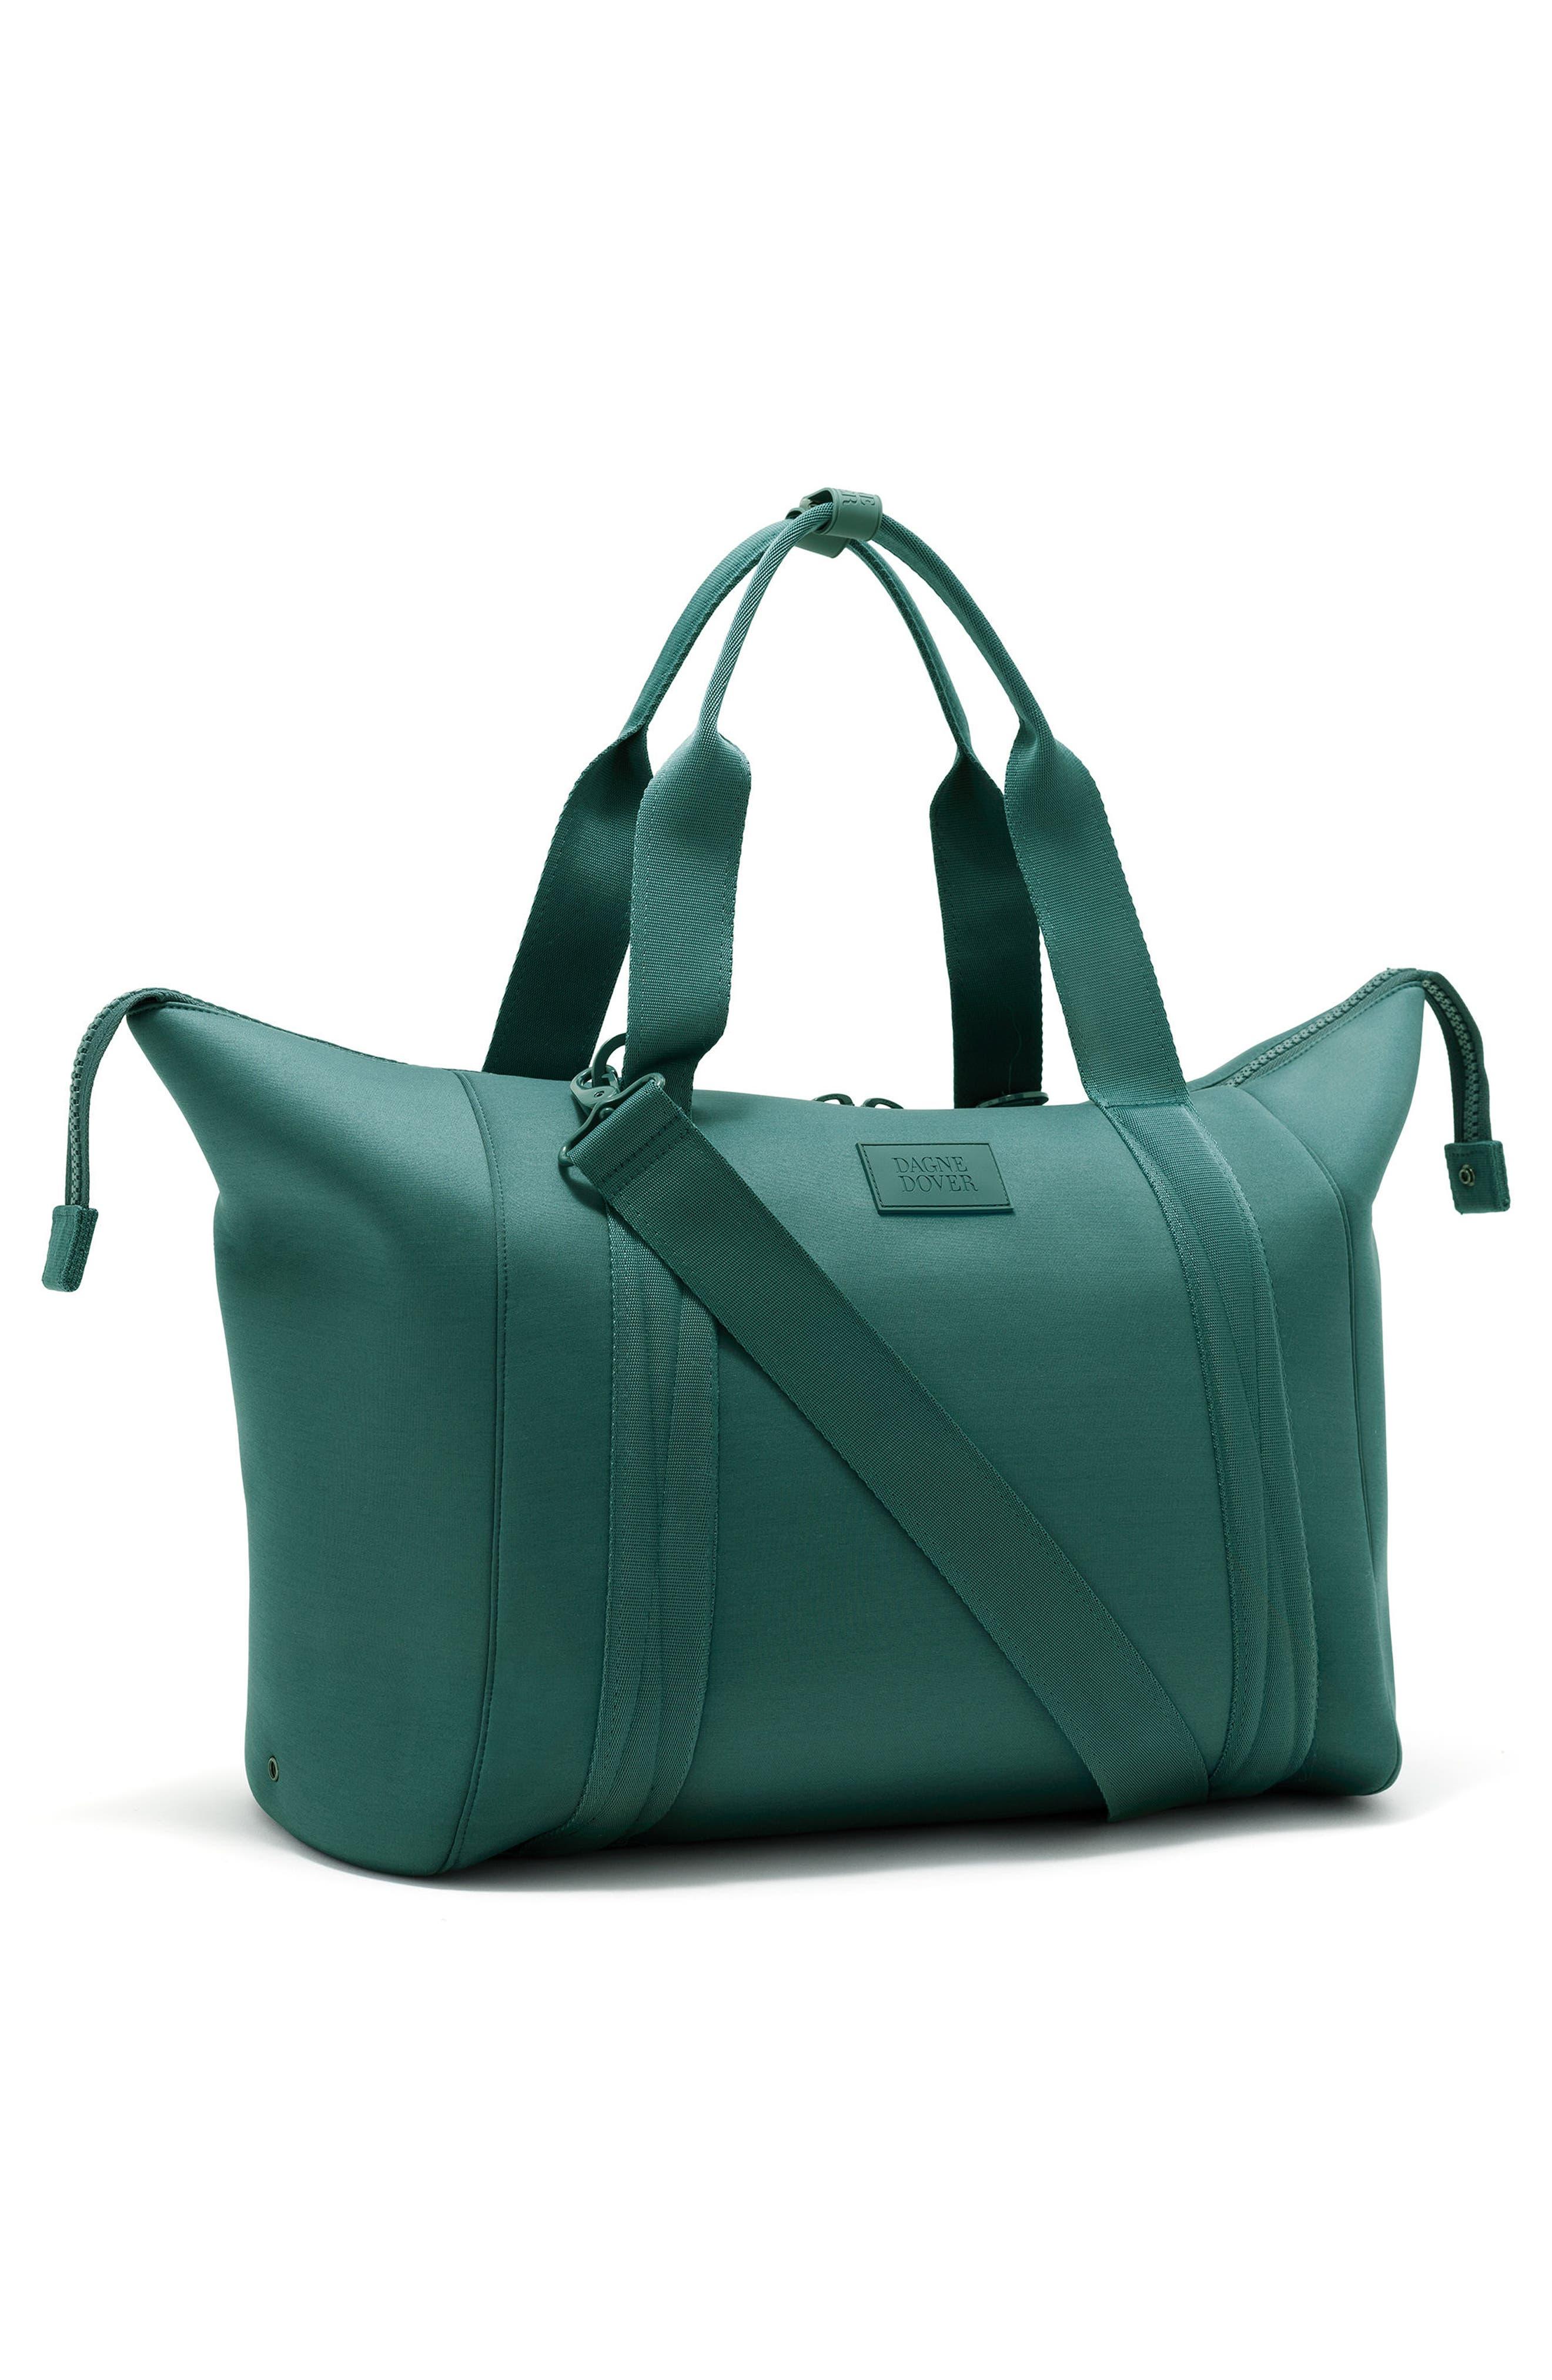 365 Large Landon Neoprene Carryall Duffel Bag,                             Alternate thumbnail 24, color,